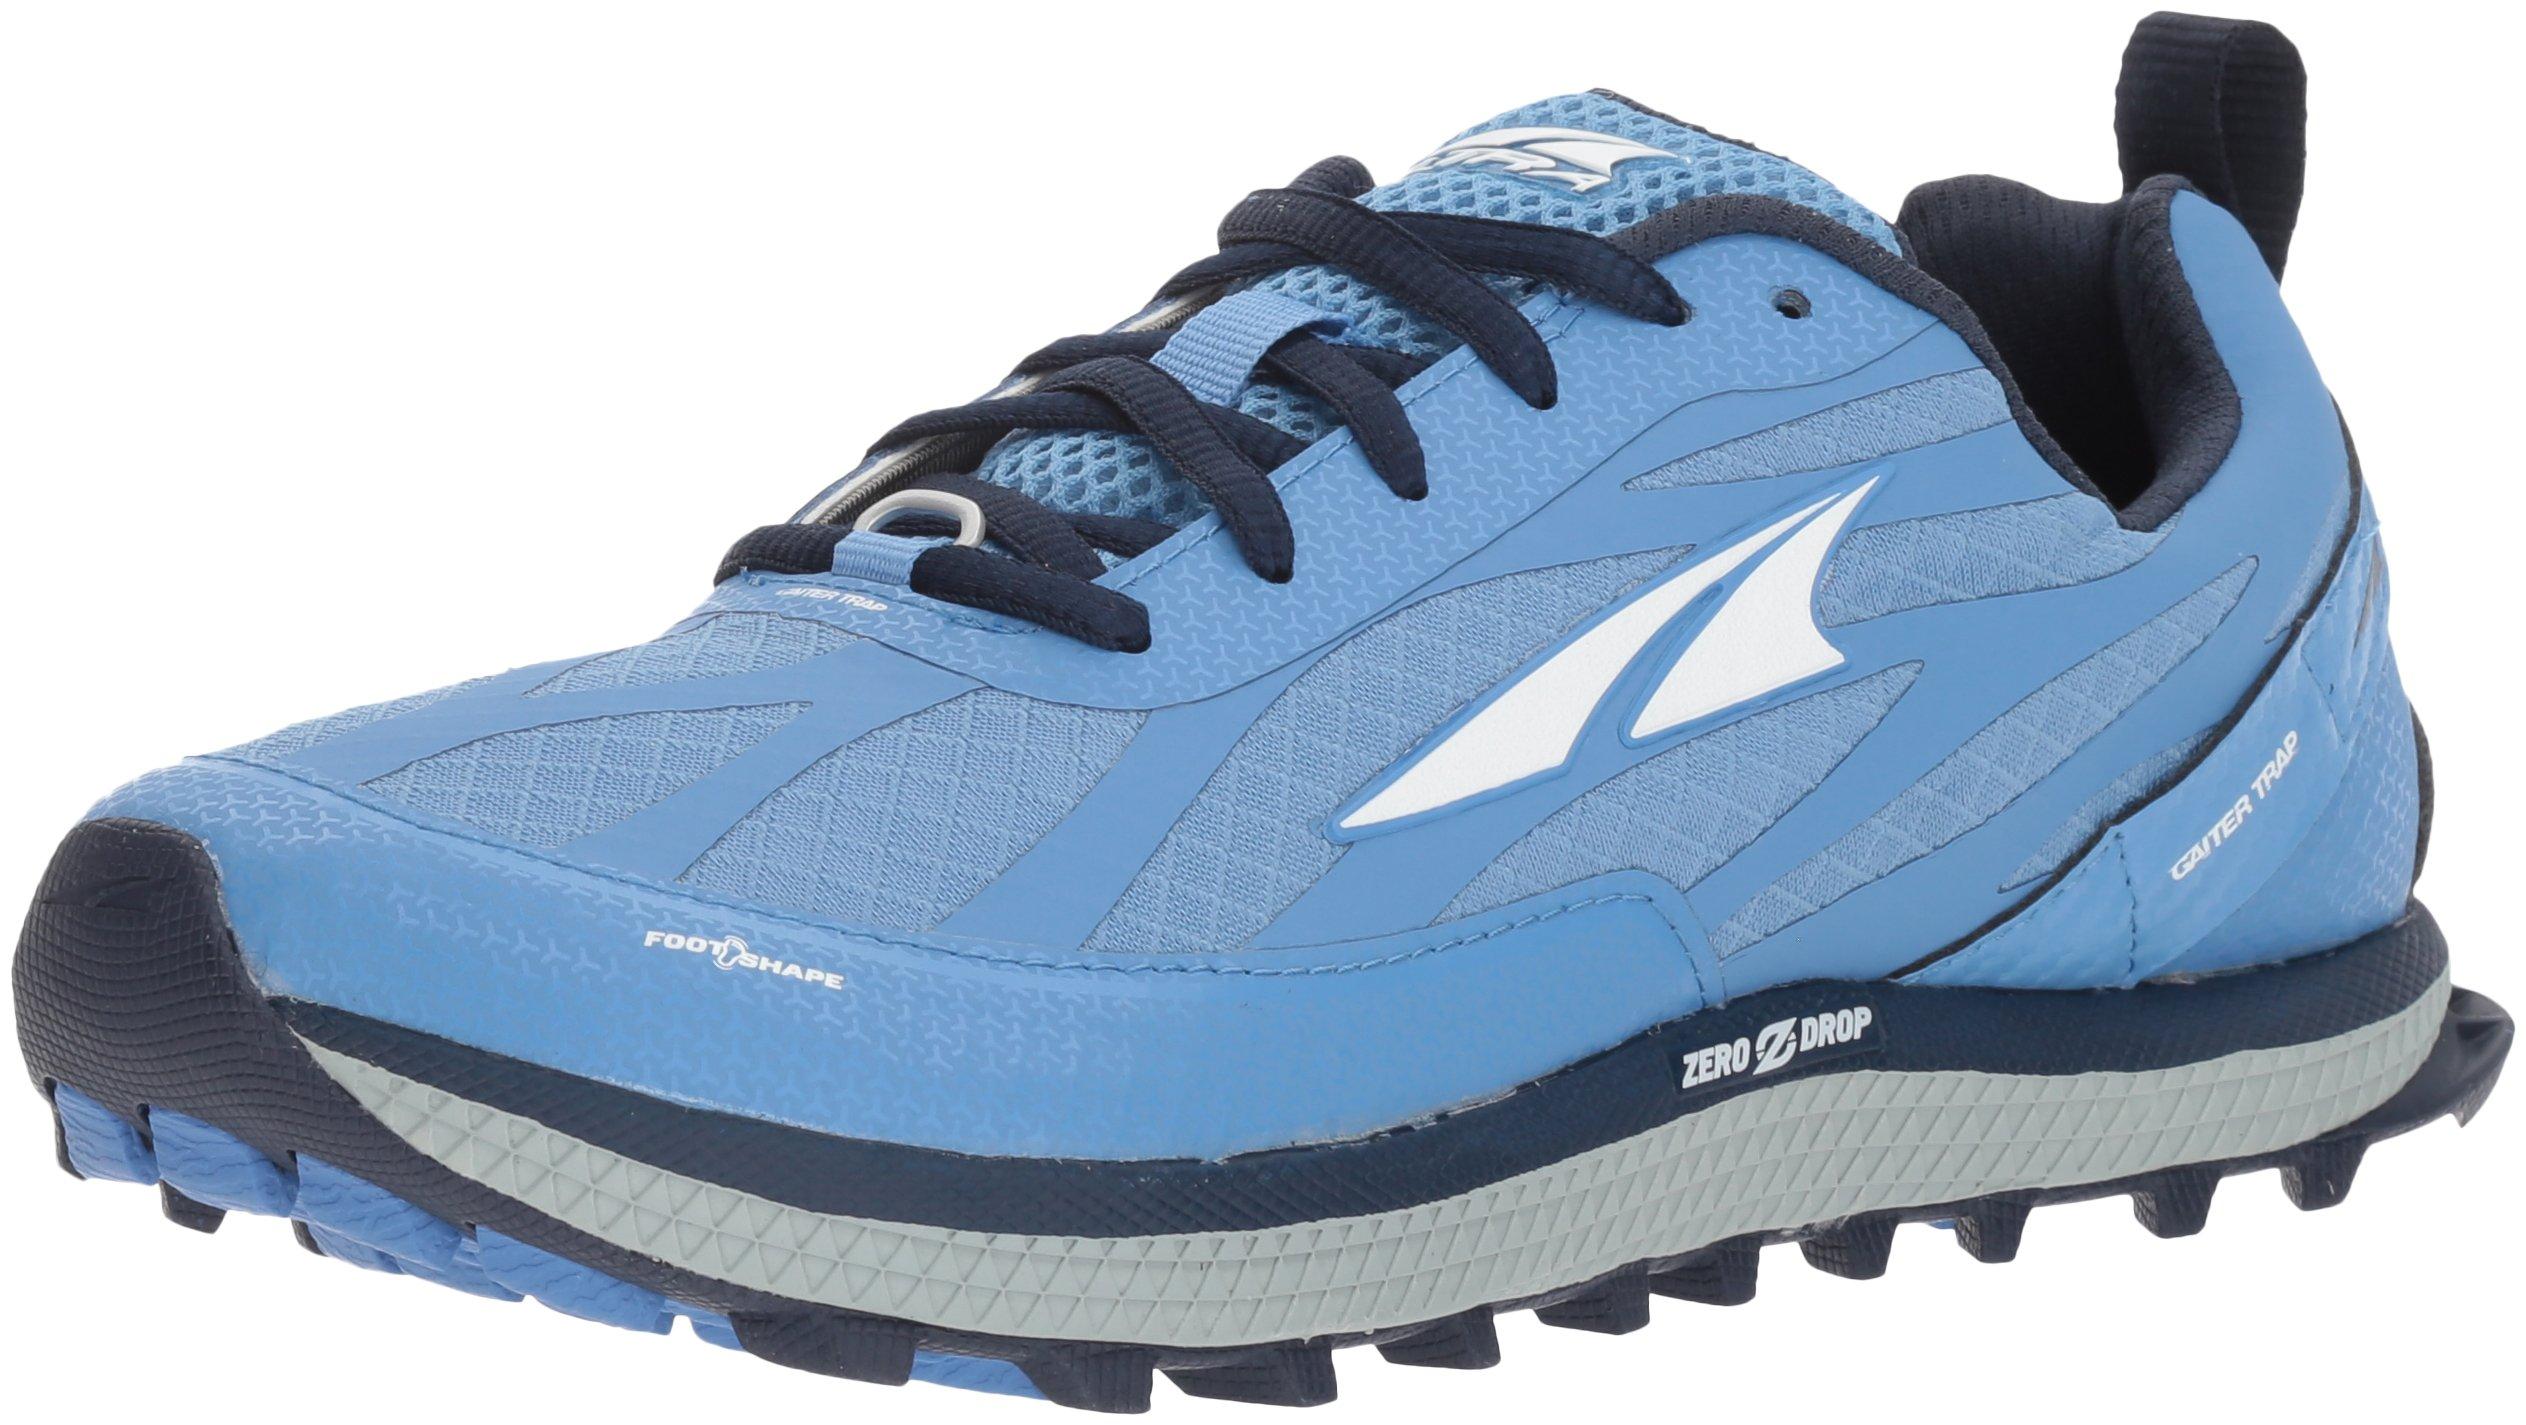 Altra Women's Superior 3.5 Sneaker, Dark Blue, 8.5 Regular US by Altra